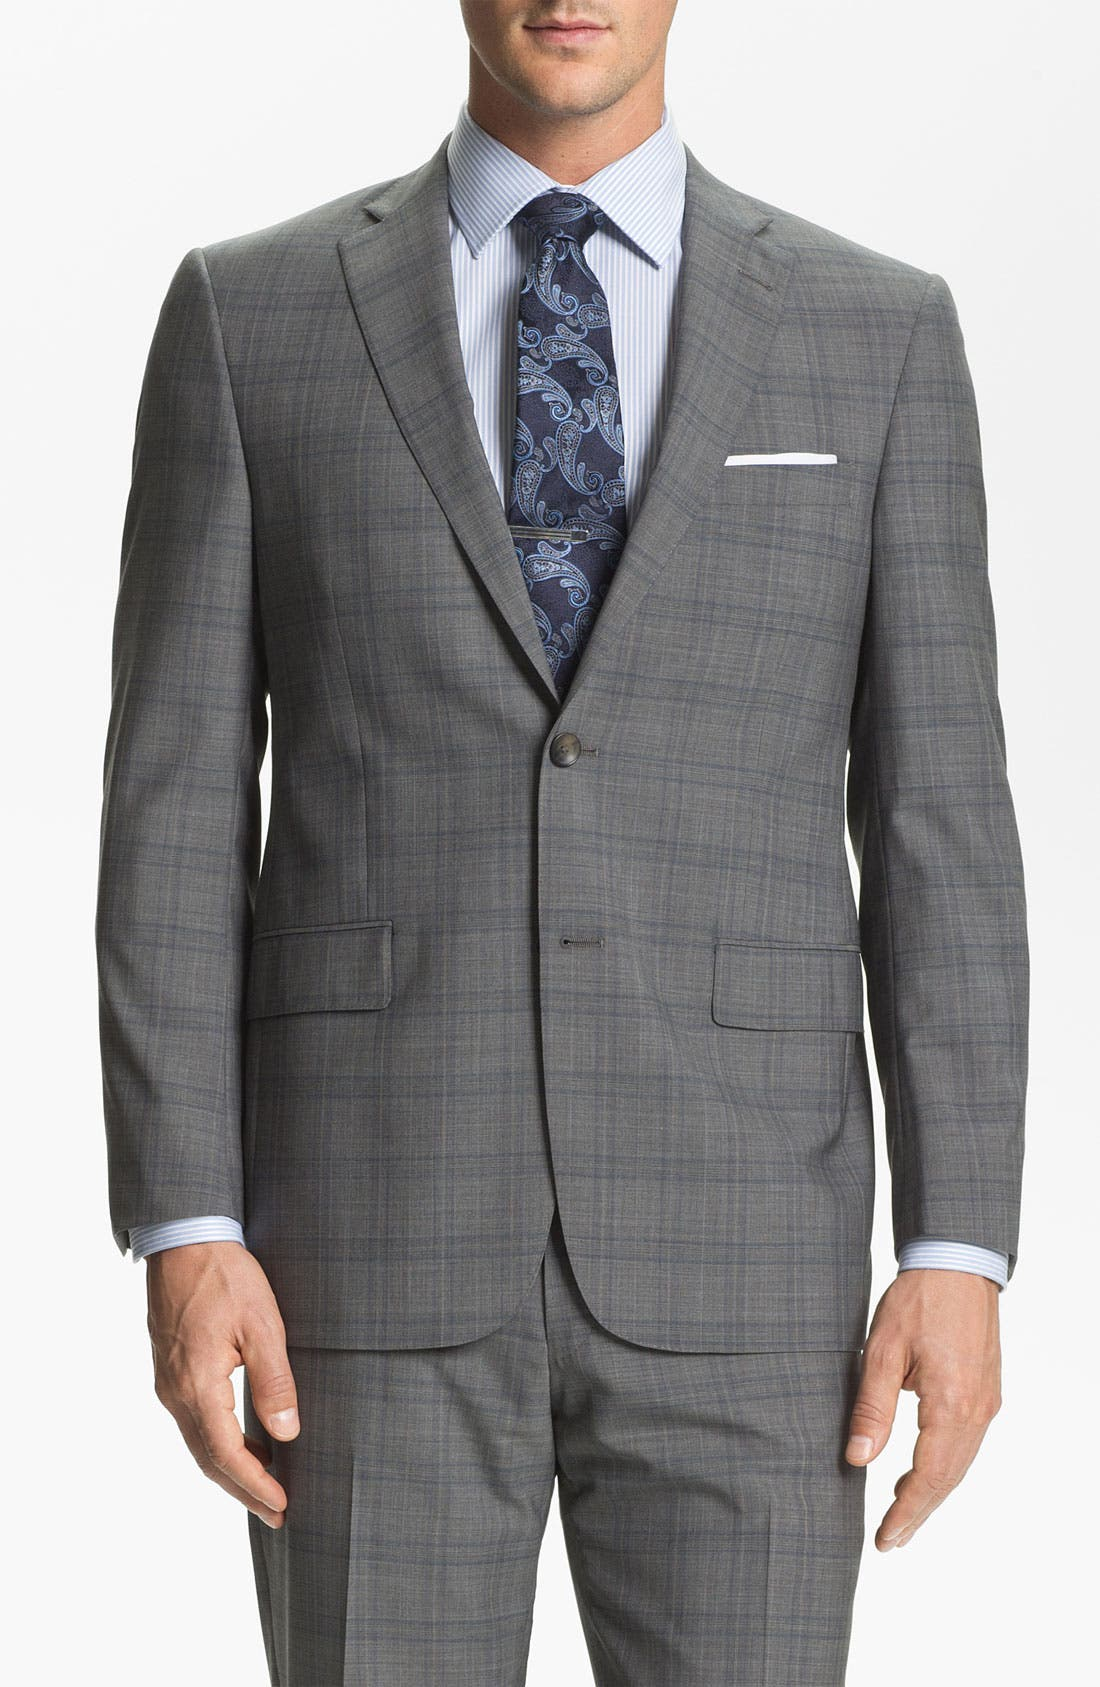 Main Image - Hart Schaffner Marx Plaid Wool Suit